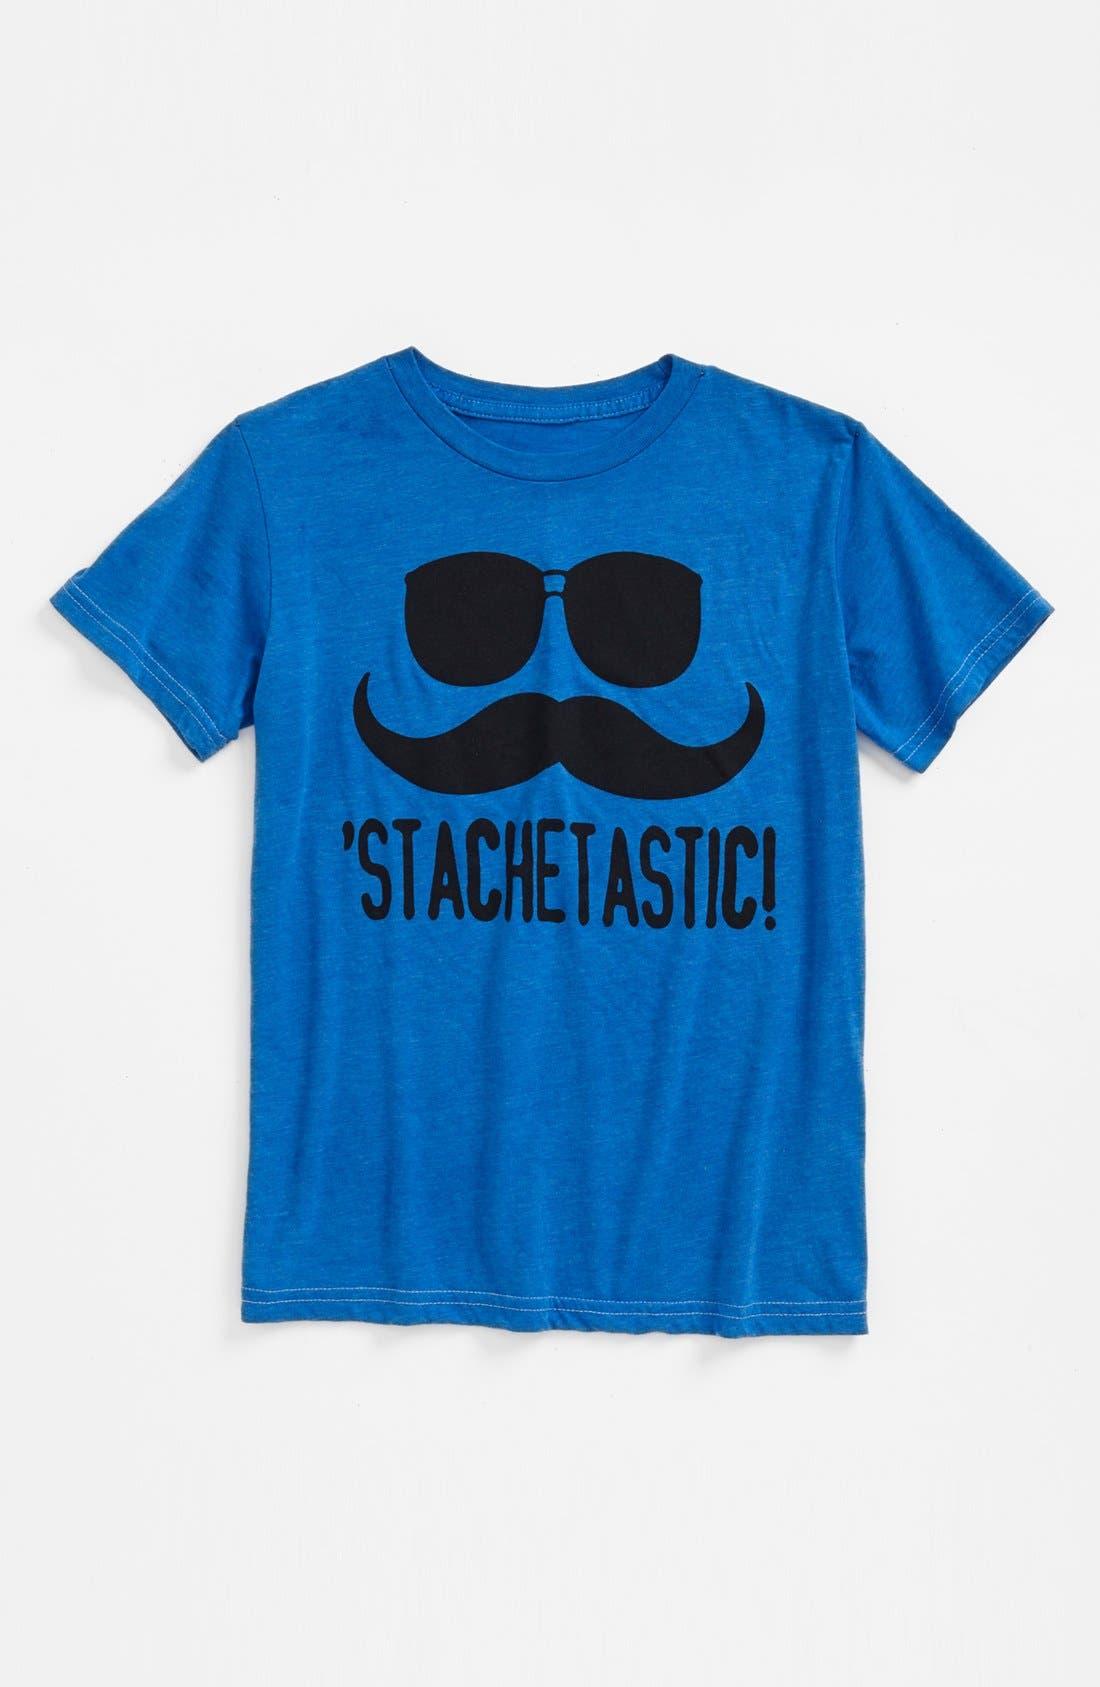 Alternate Image 1 Selected - Jem 'Stachetastic' Screenprint T-Shirt (Big Boys)